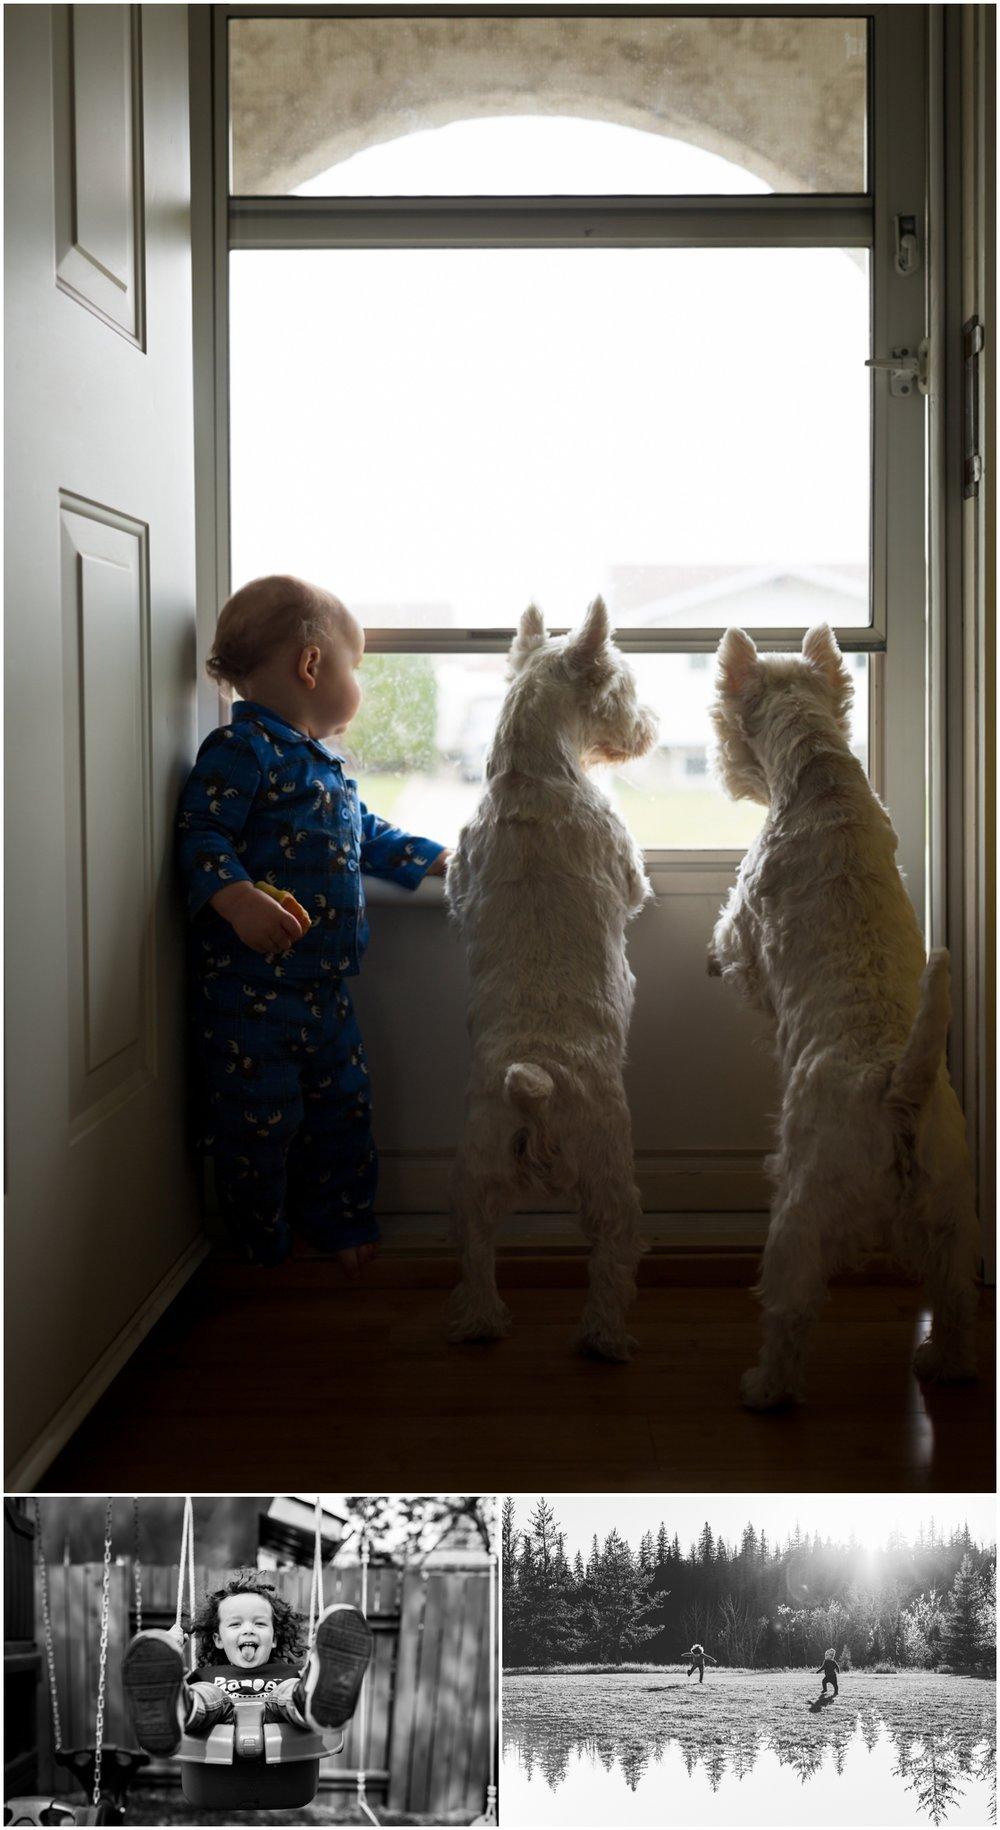 Edmonton child photographer - Best of 2016 - Dog Photographer - Westies